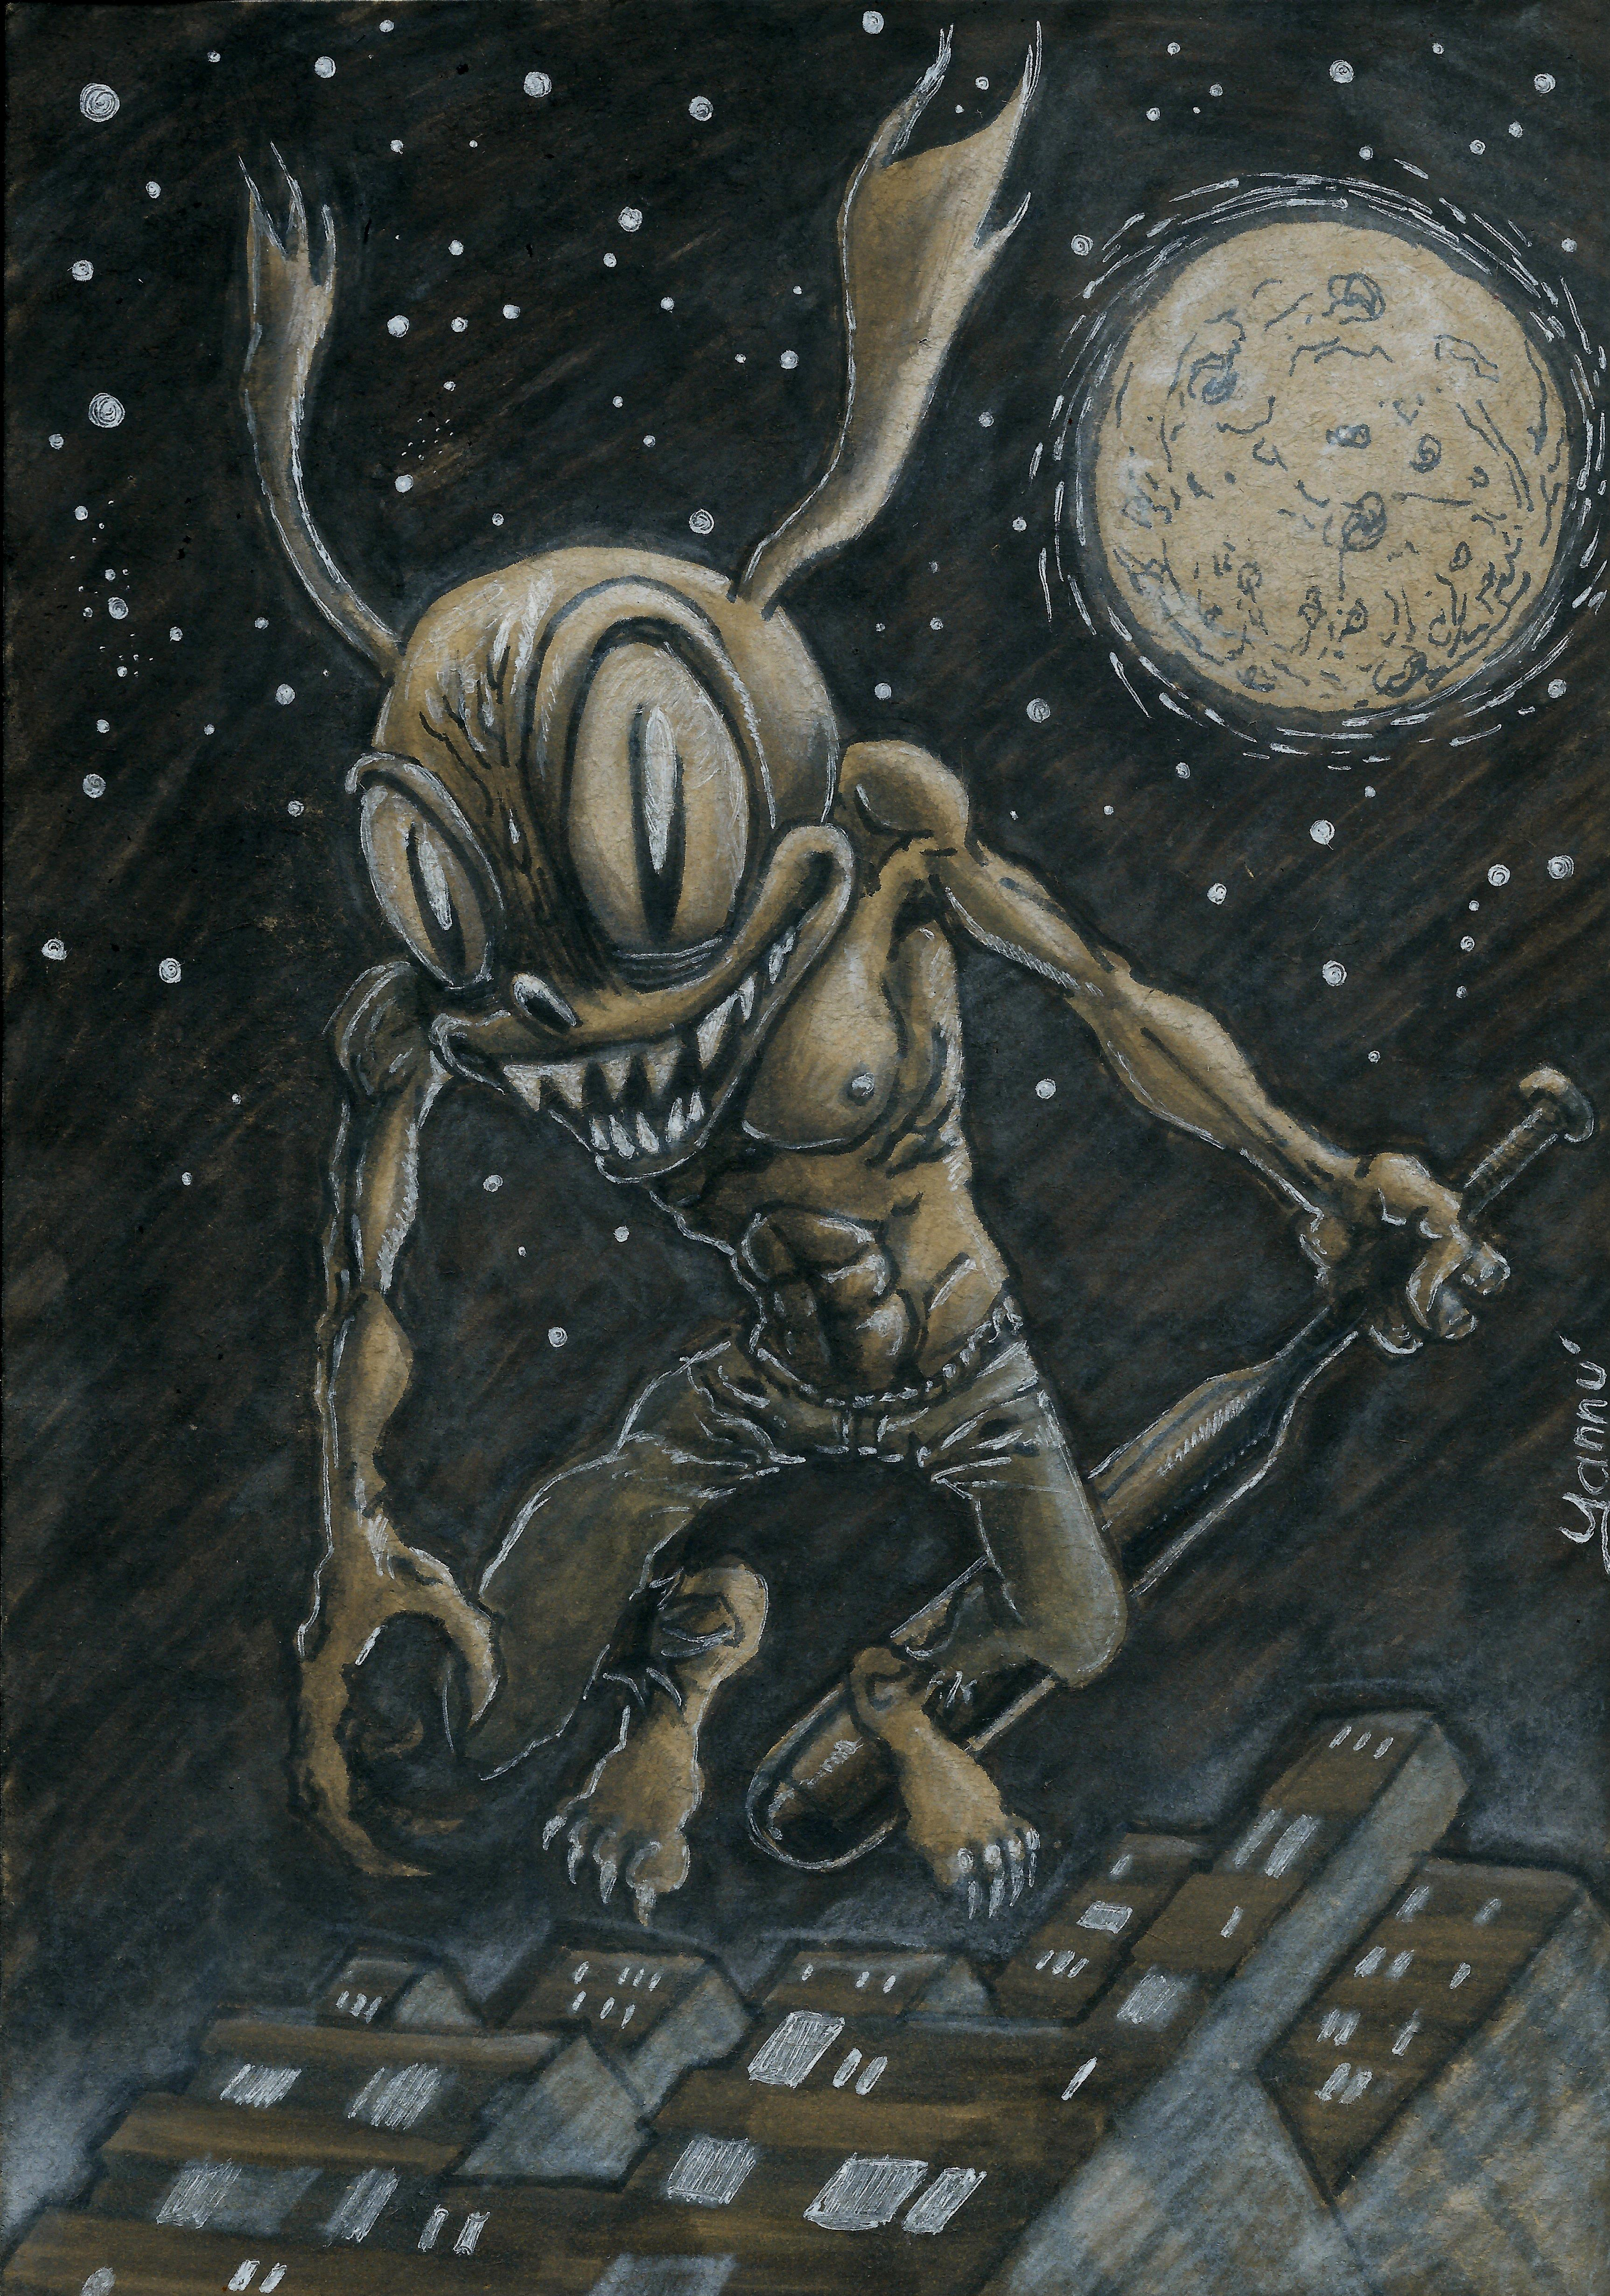 Halloween Daily monster #26